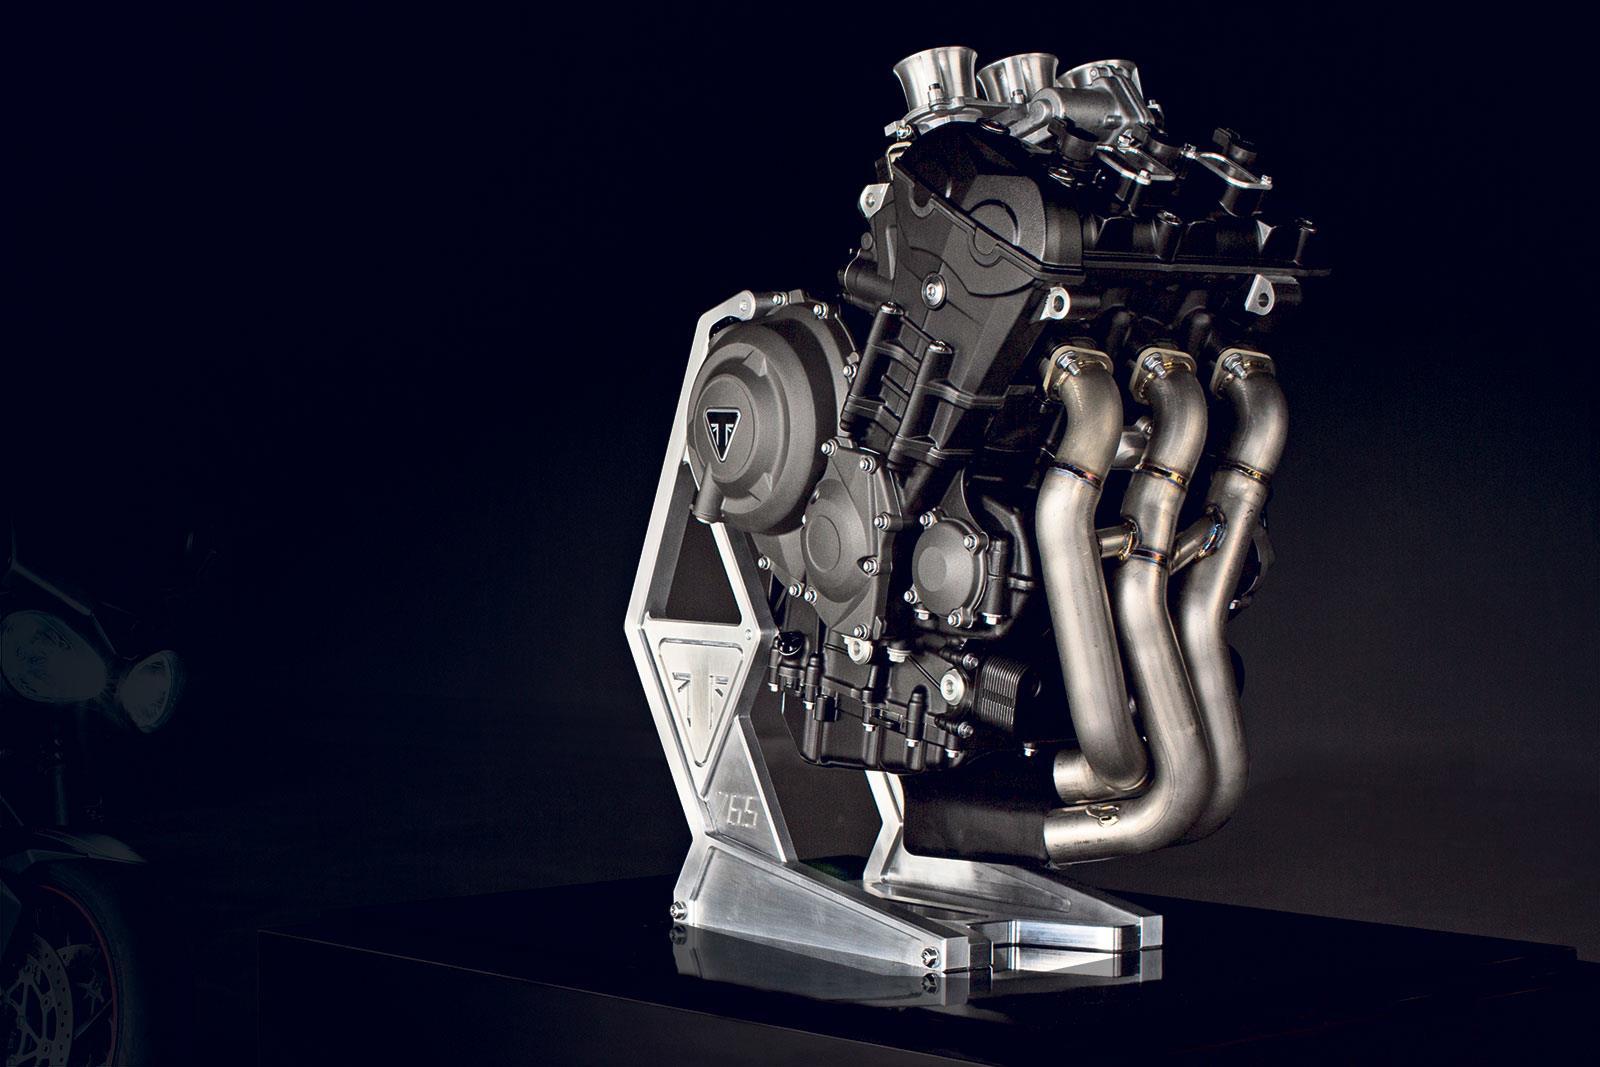 Triumph 765 Moto2 engine